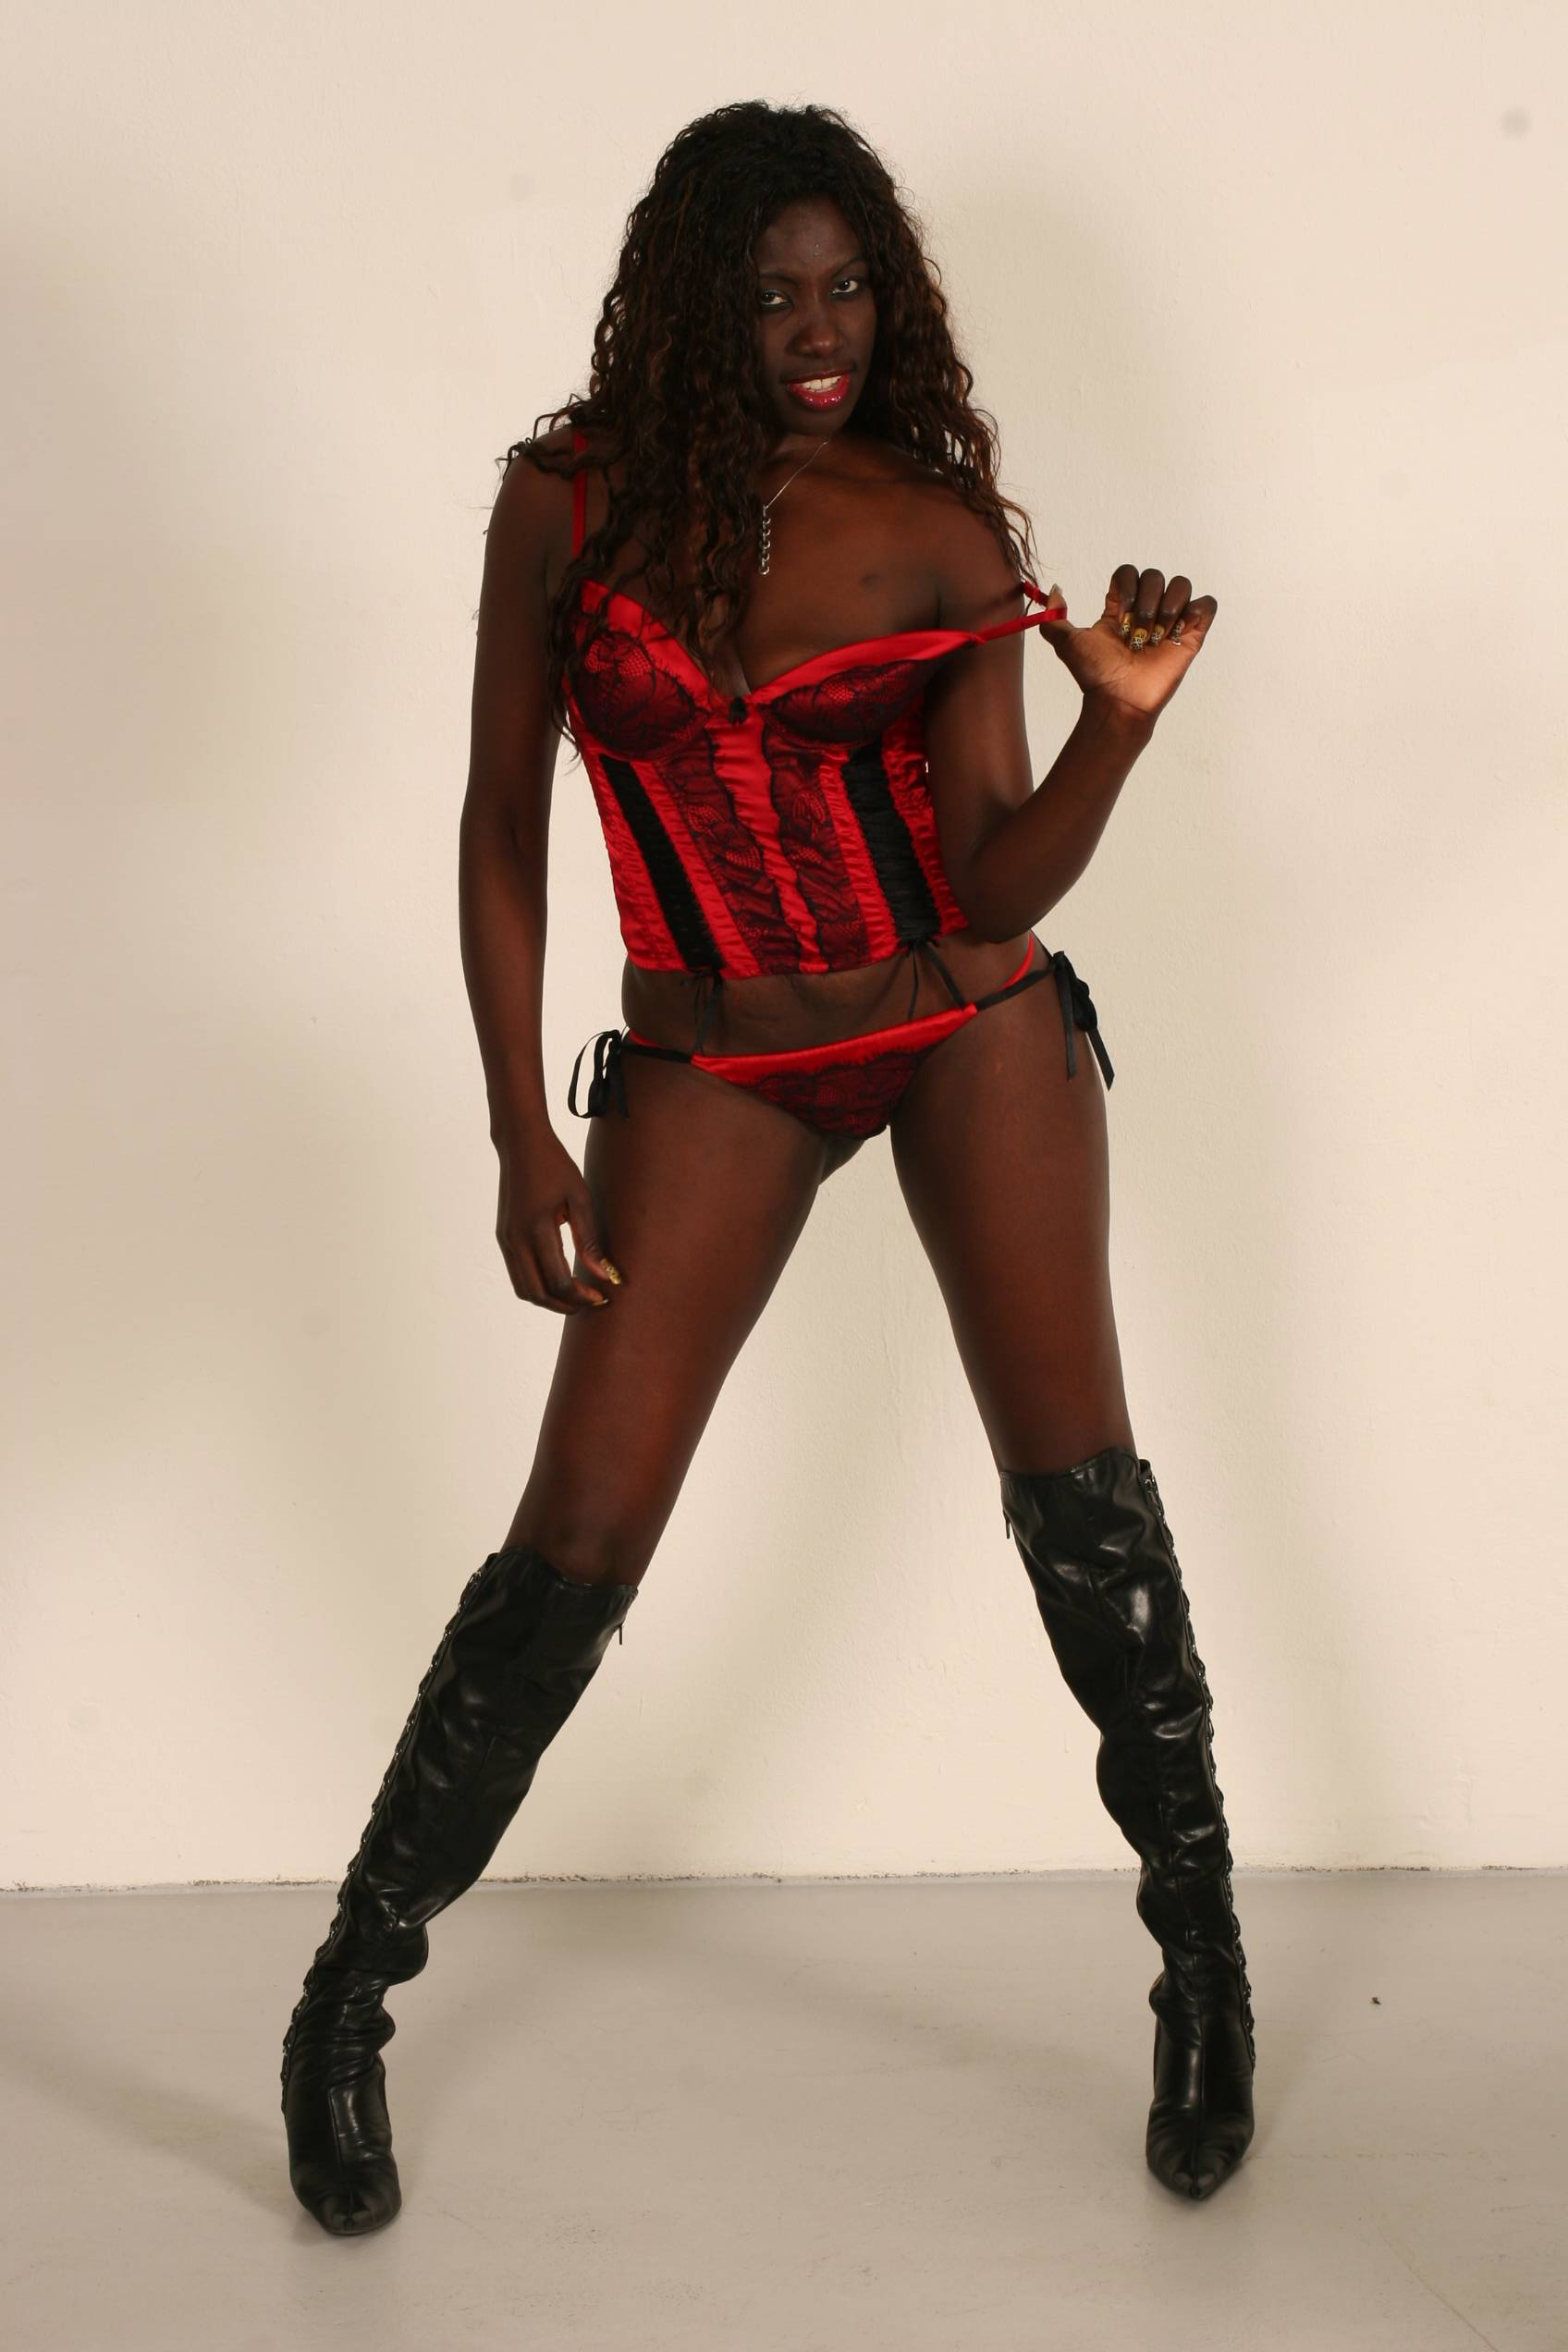 Vivian Tigress 6